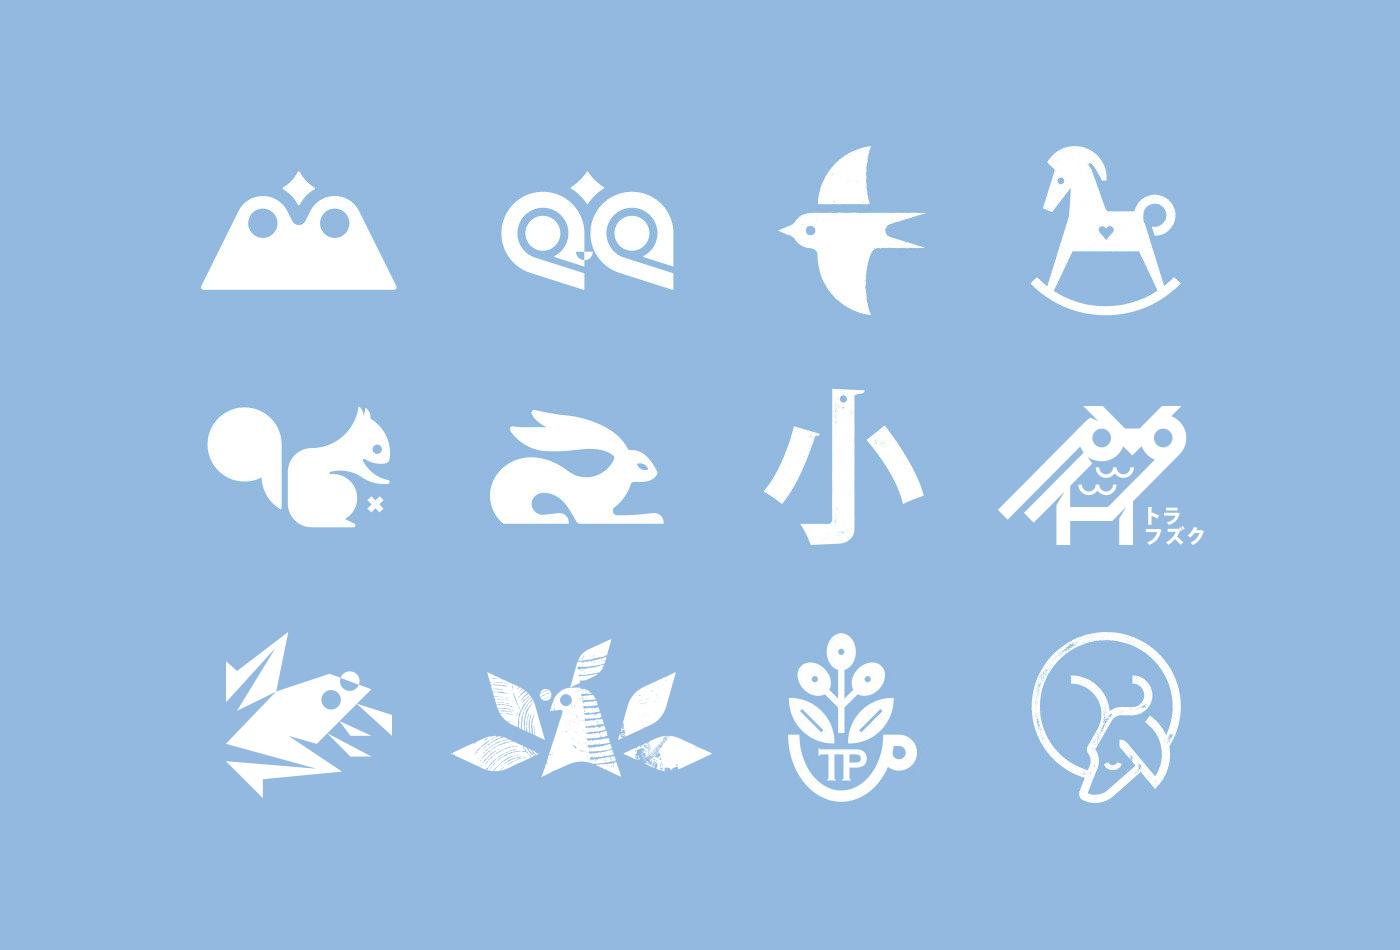 C-logo-symbol-logos-pictogram-marks-trademarks-trademark-glyph-icon-icons-logotype-collection-vacaliebres-birds-fukuro